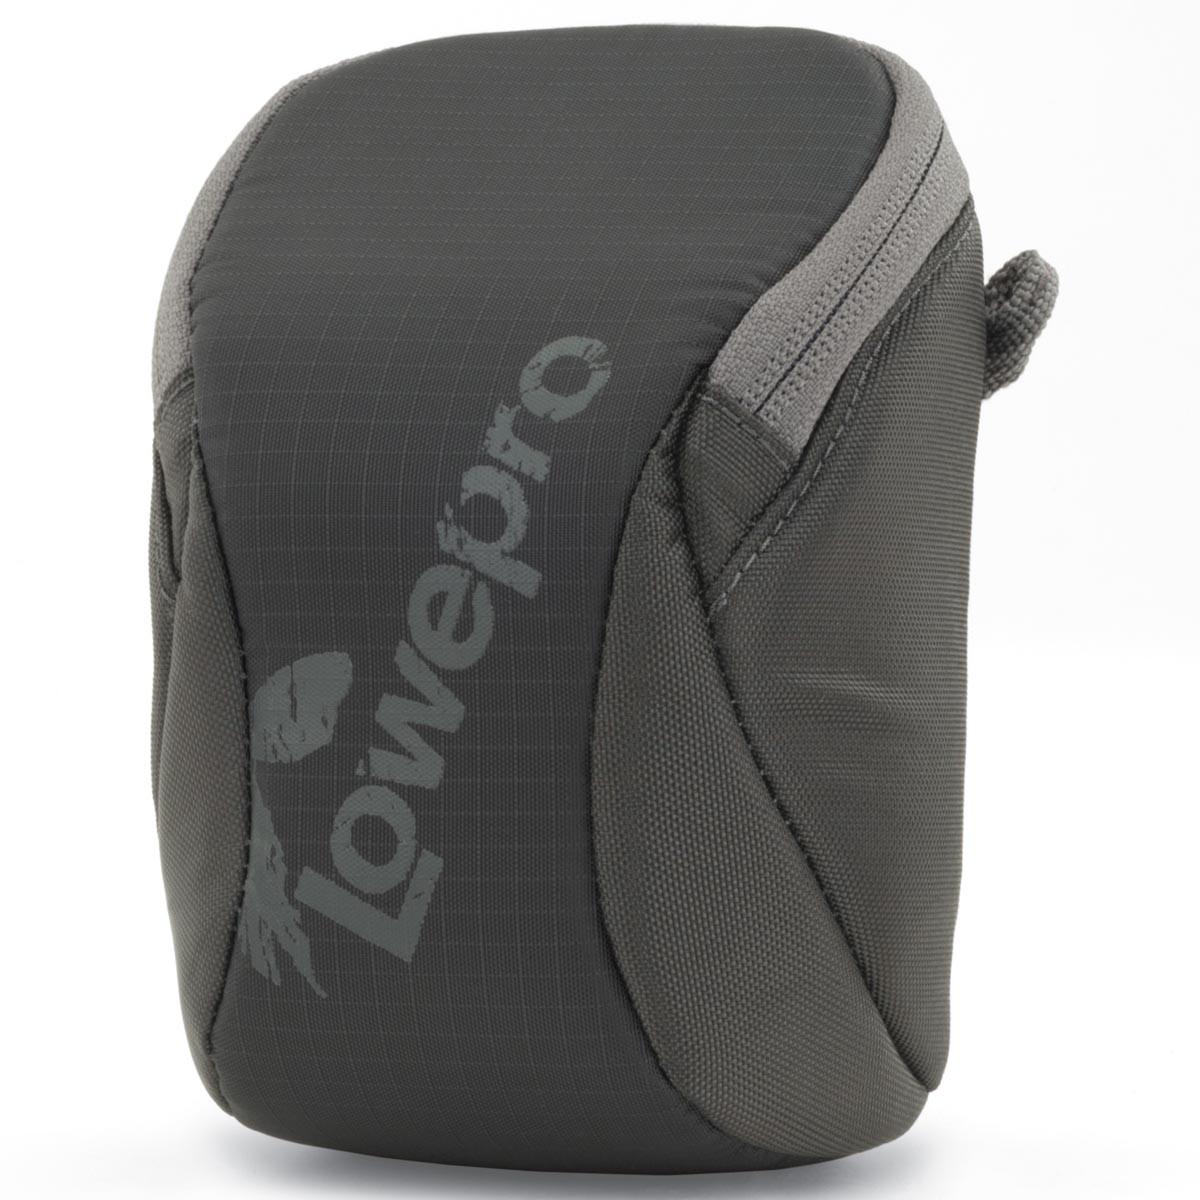 Lowepro Dashpoint 20 Compact Camera Case